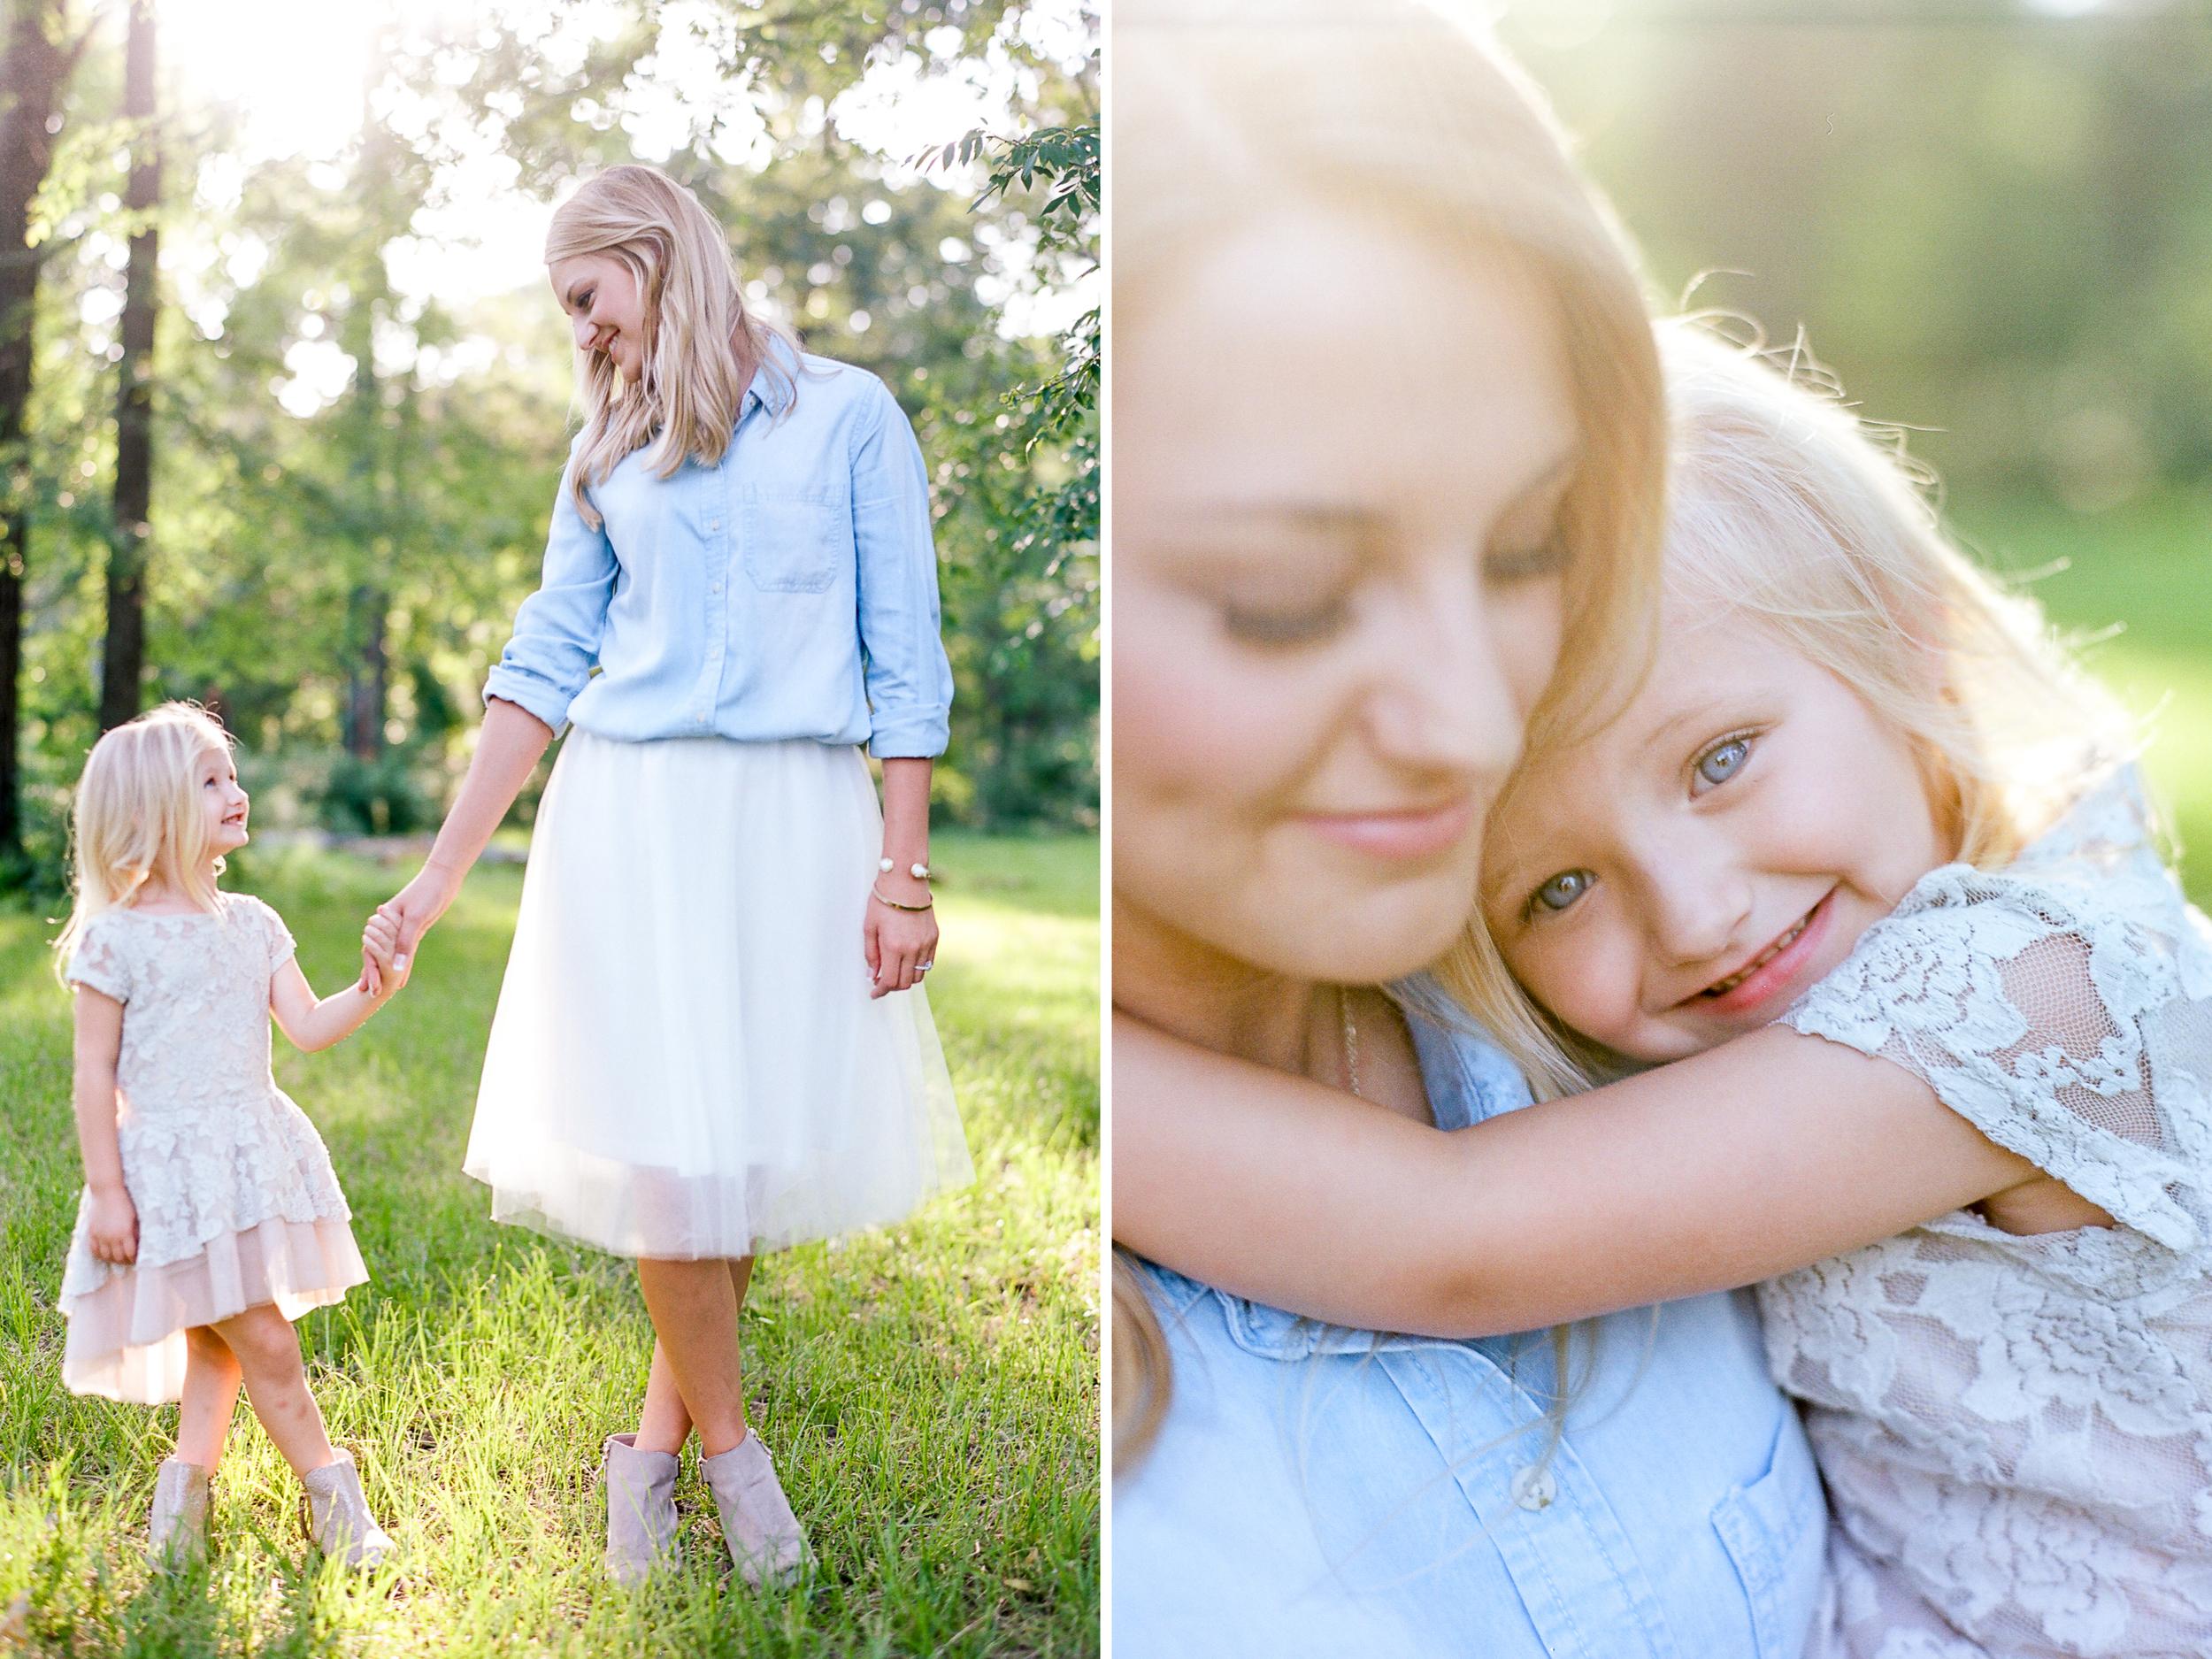 Dana-Fernandez-Photography-Houston-Portrait-Photographer-Film-Children-Family-Maternity-Senior-Photographer-201.jpg